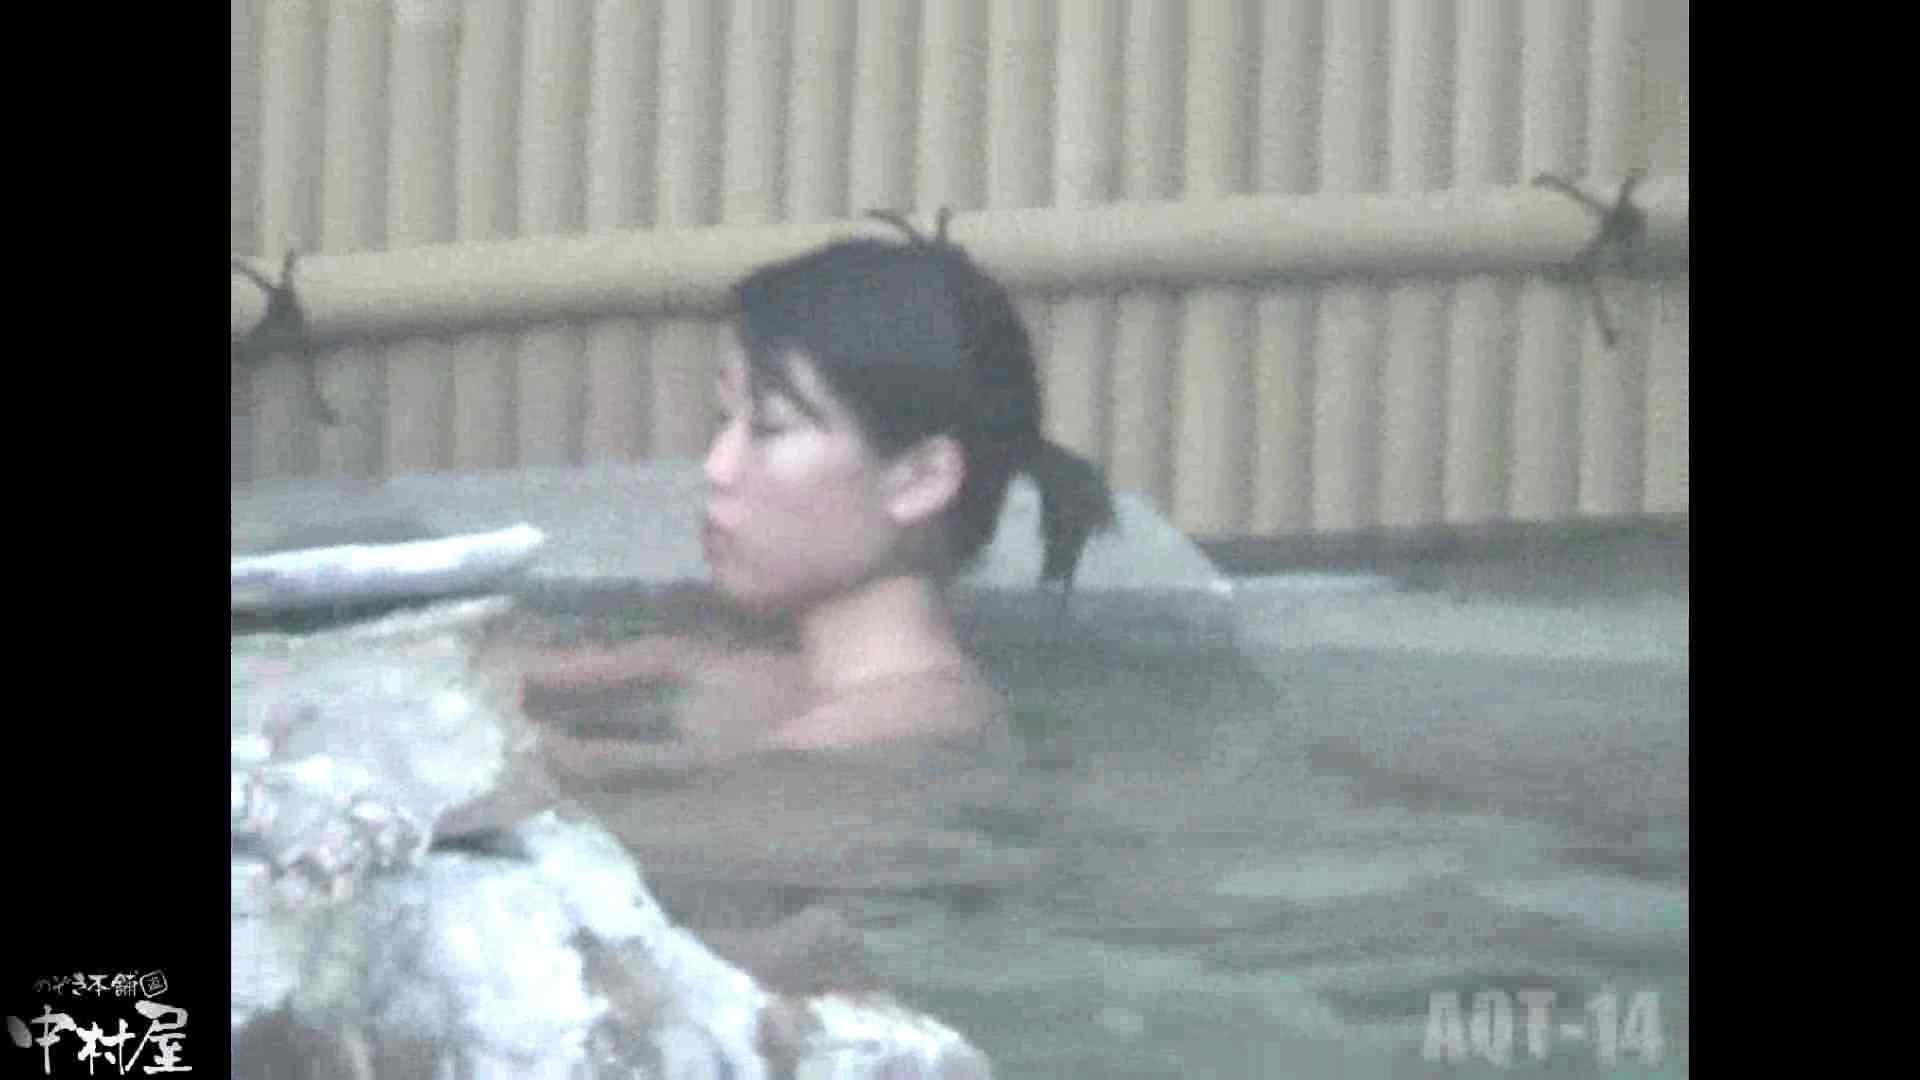 Aquaな露天風呂Vol.878潜入盗撮露天風呂十四判湯 其の一 潜入画像   露天  59画像 14